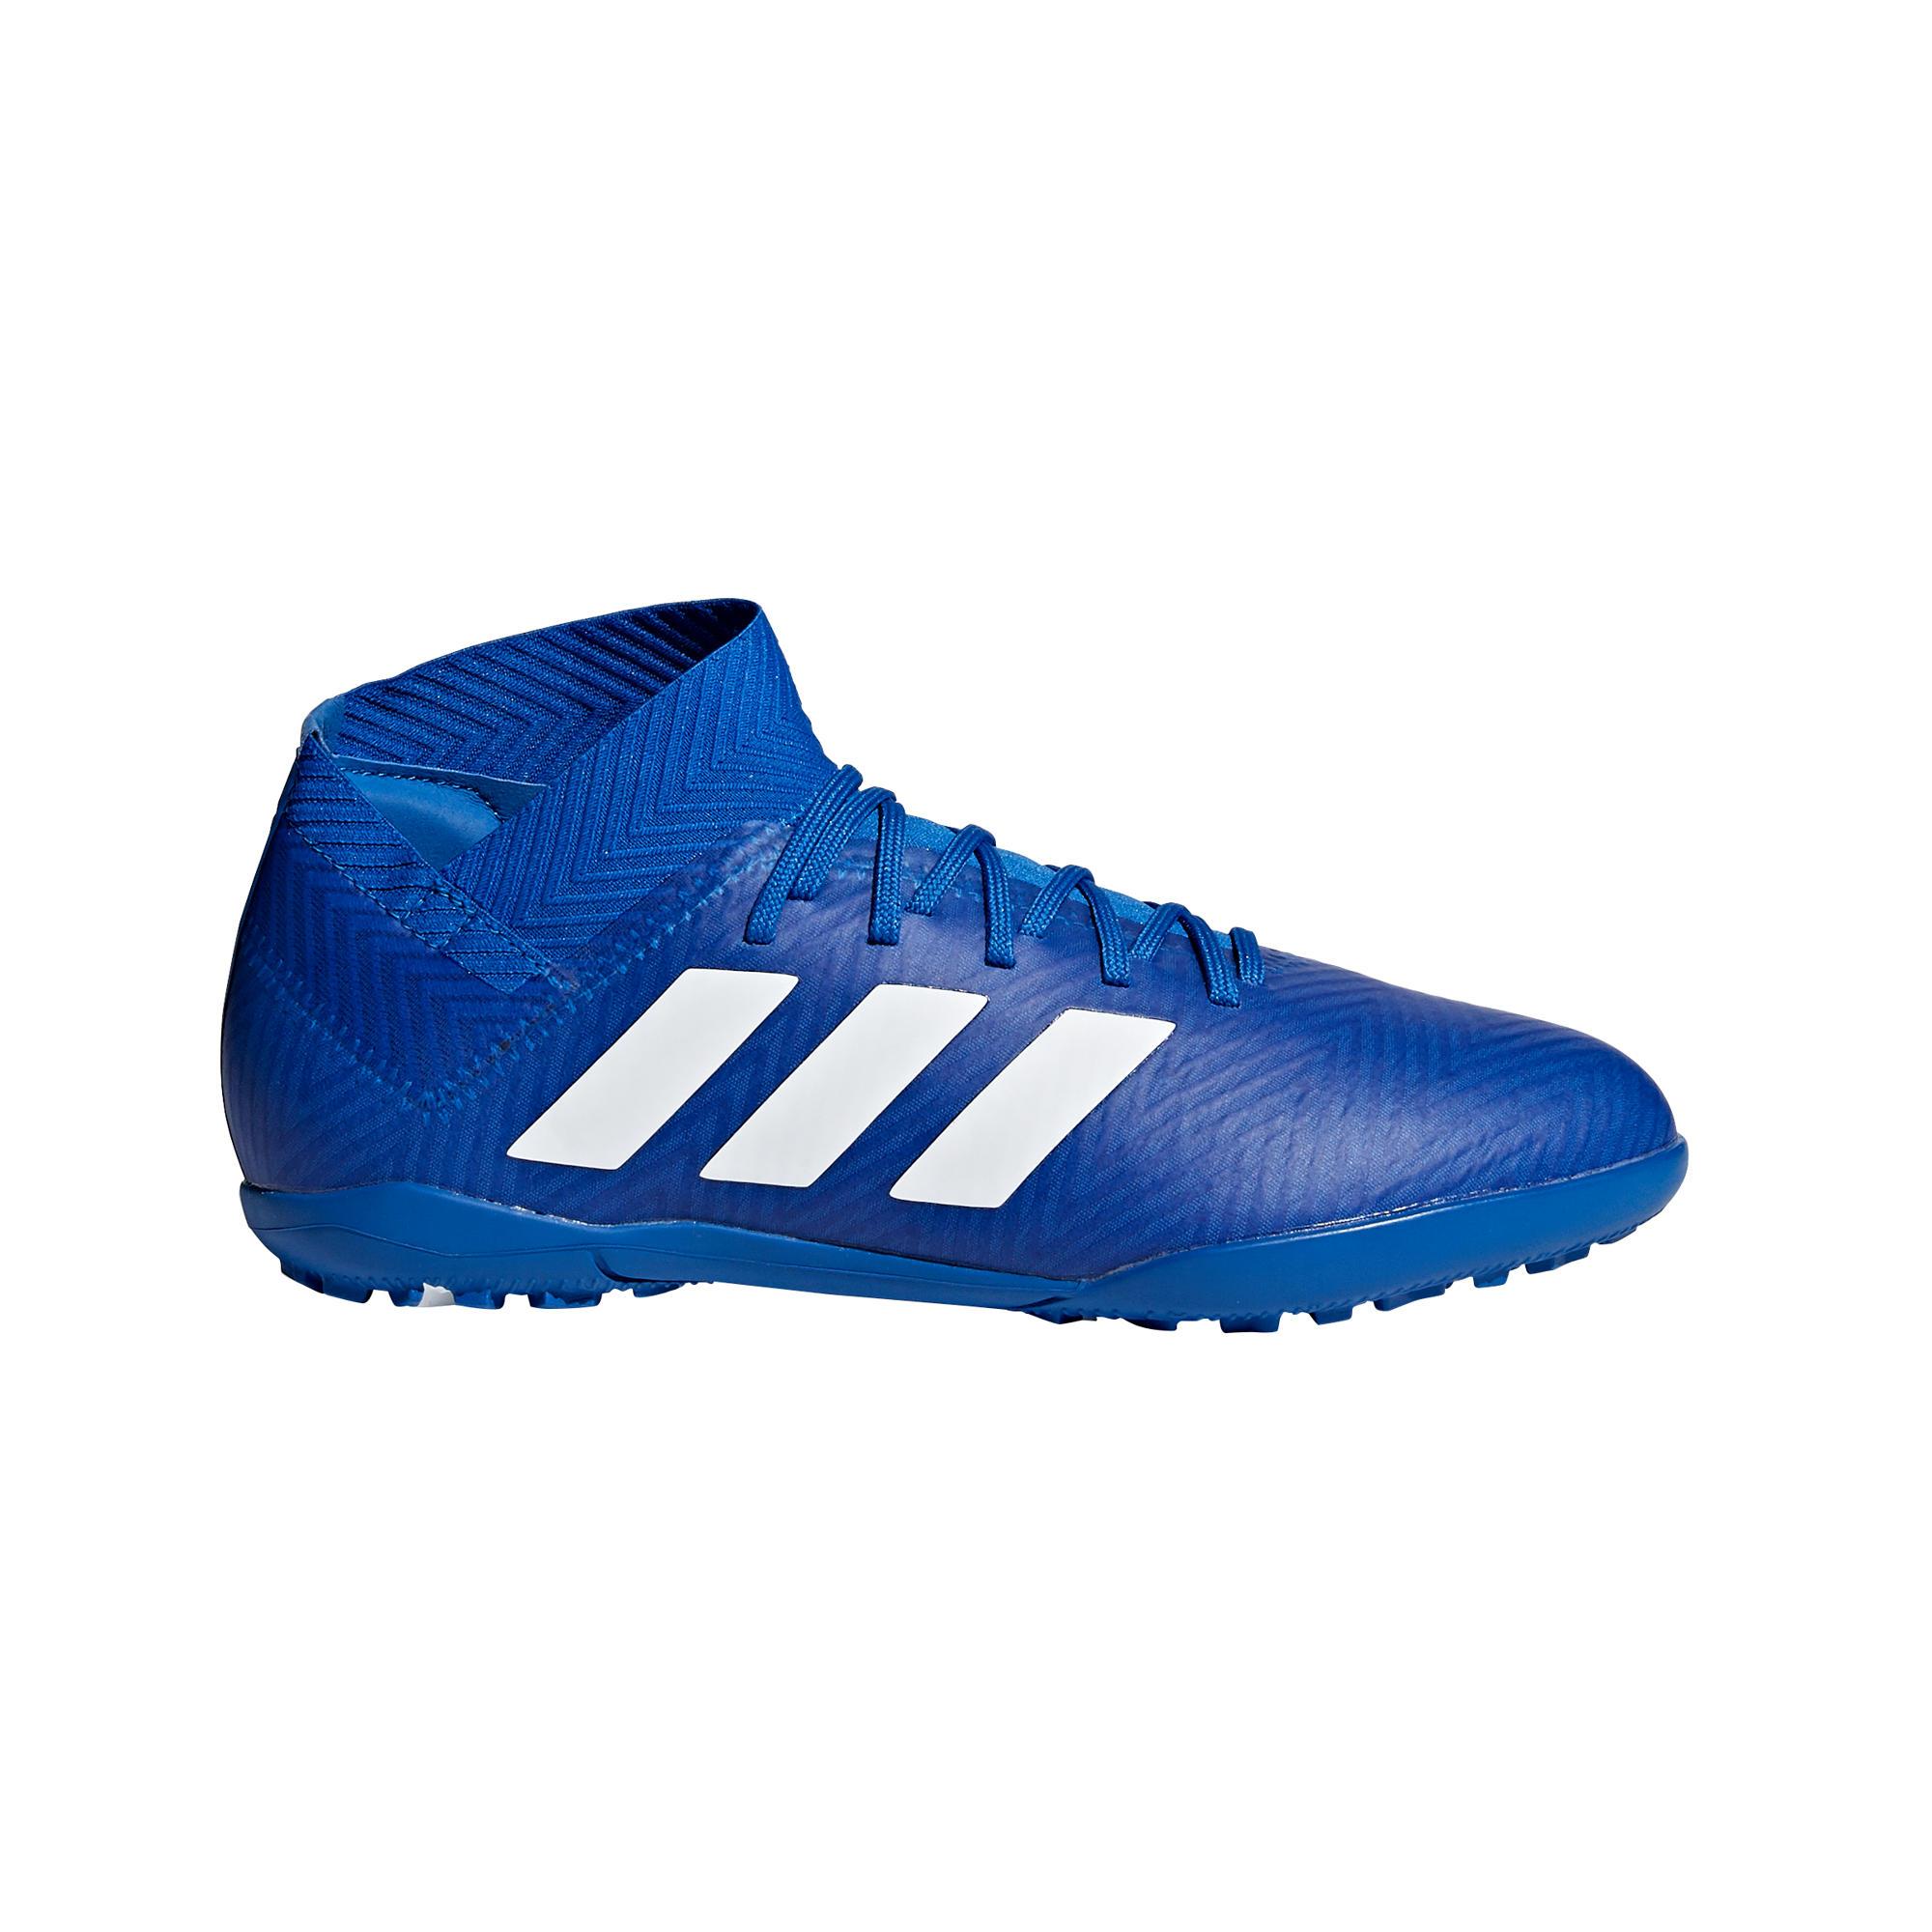 adidas scarpe calcio nemezis